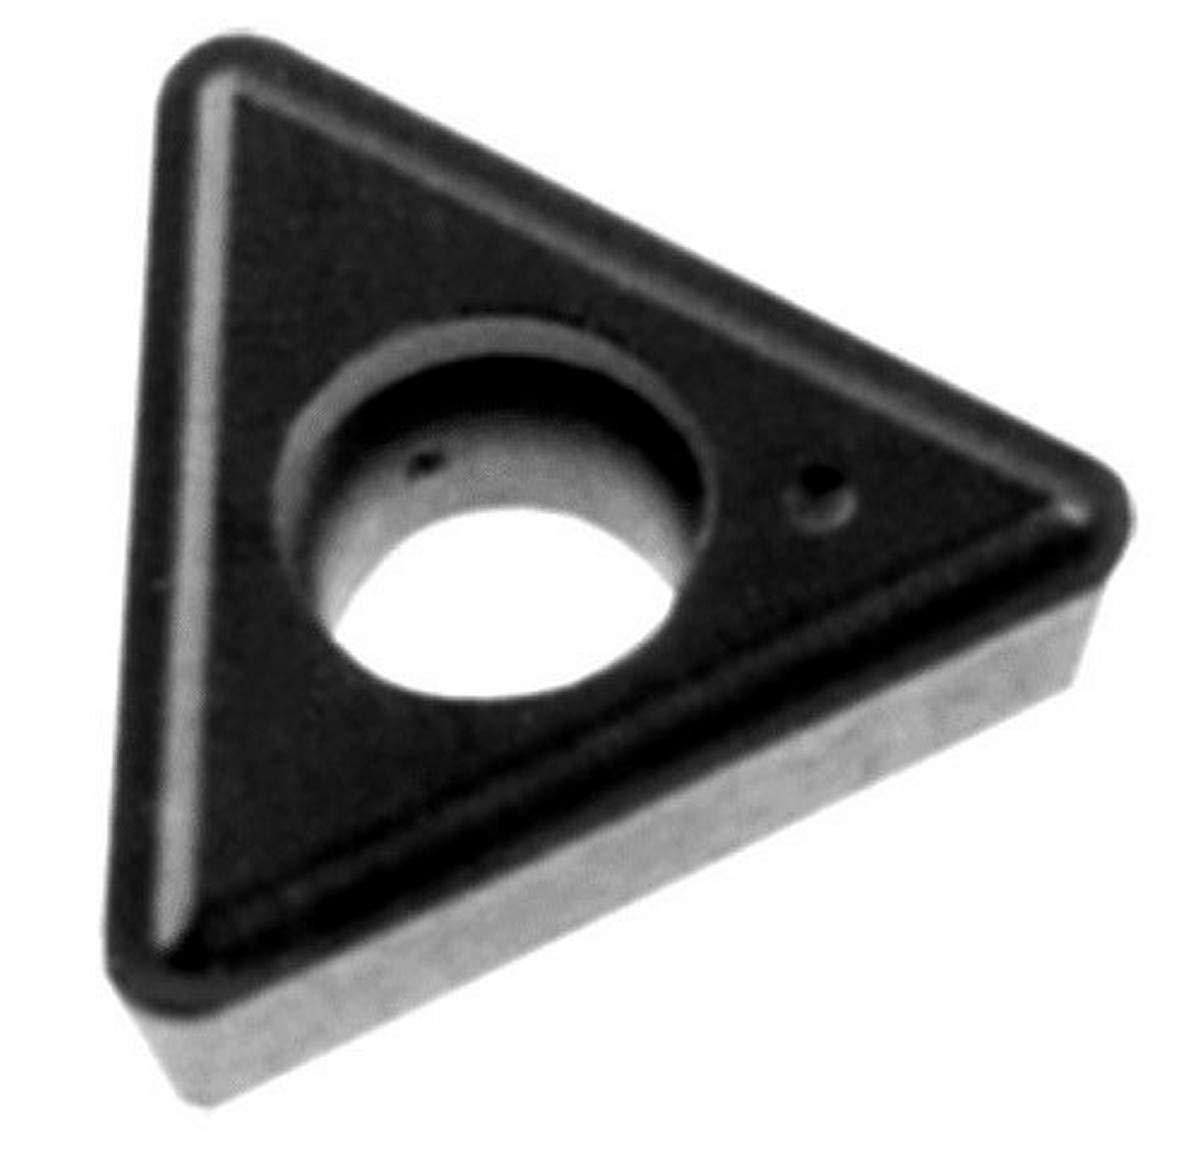 Cobra Carbide 41820 Solid Turning Un Regular dealer Insert C550 Grade Factory outlet